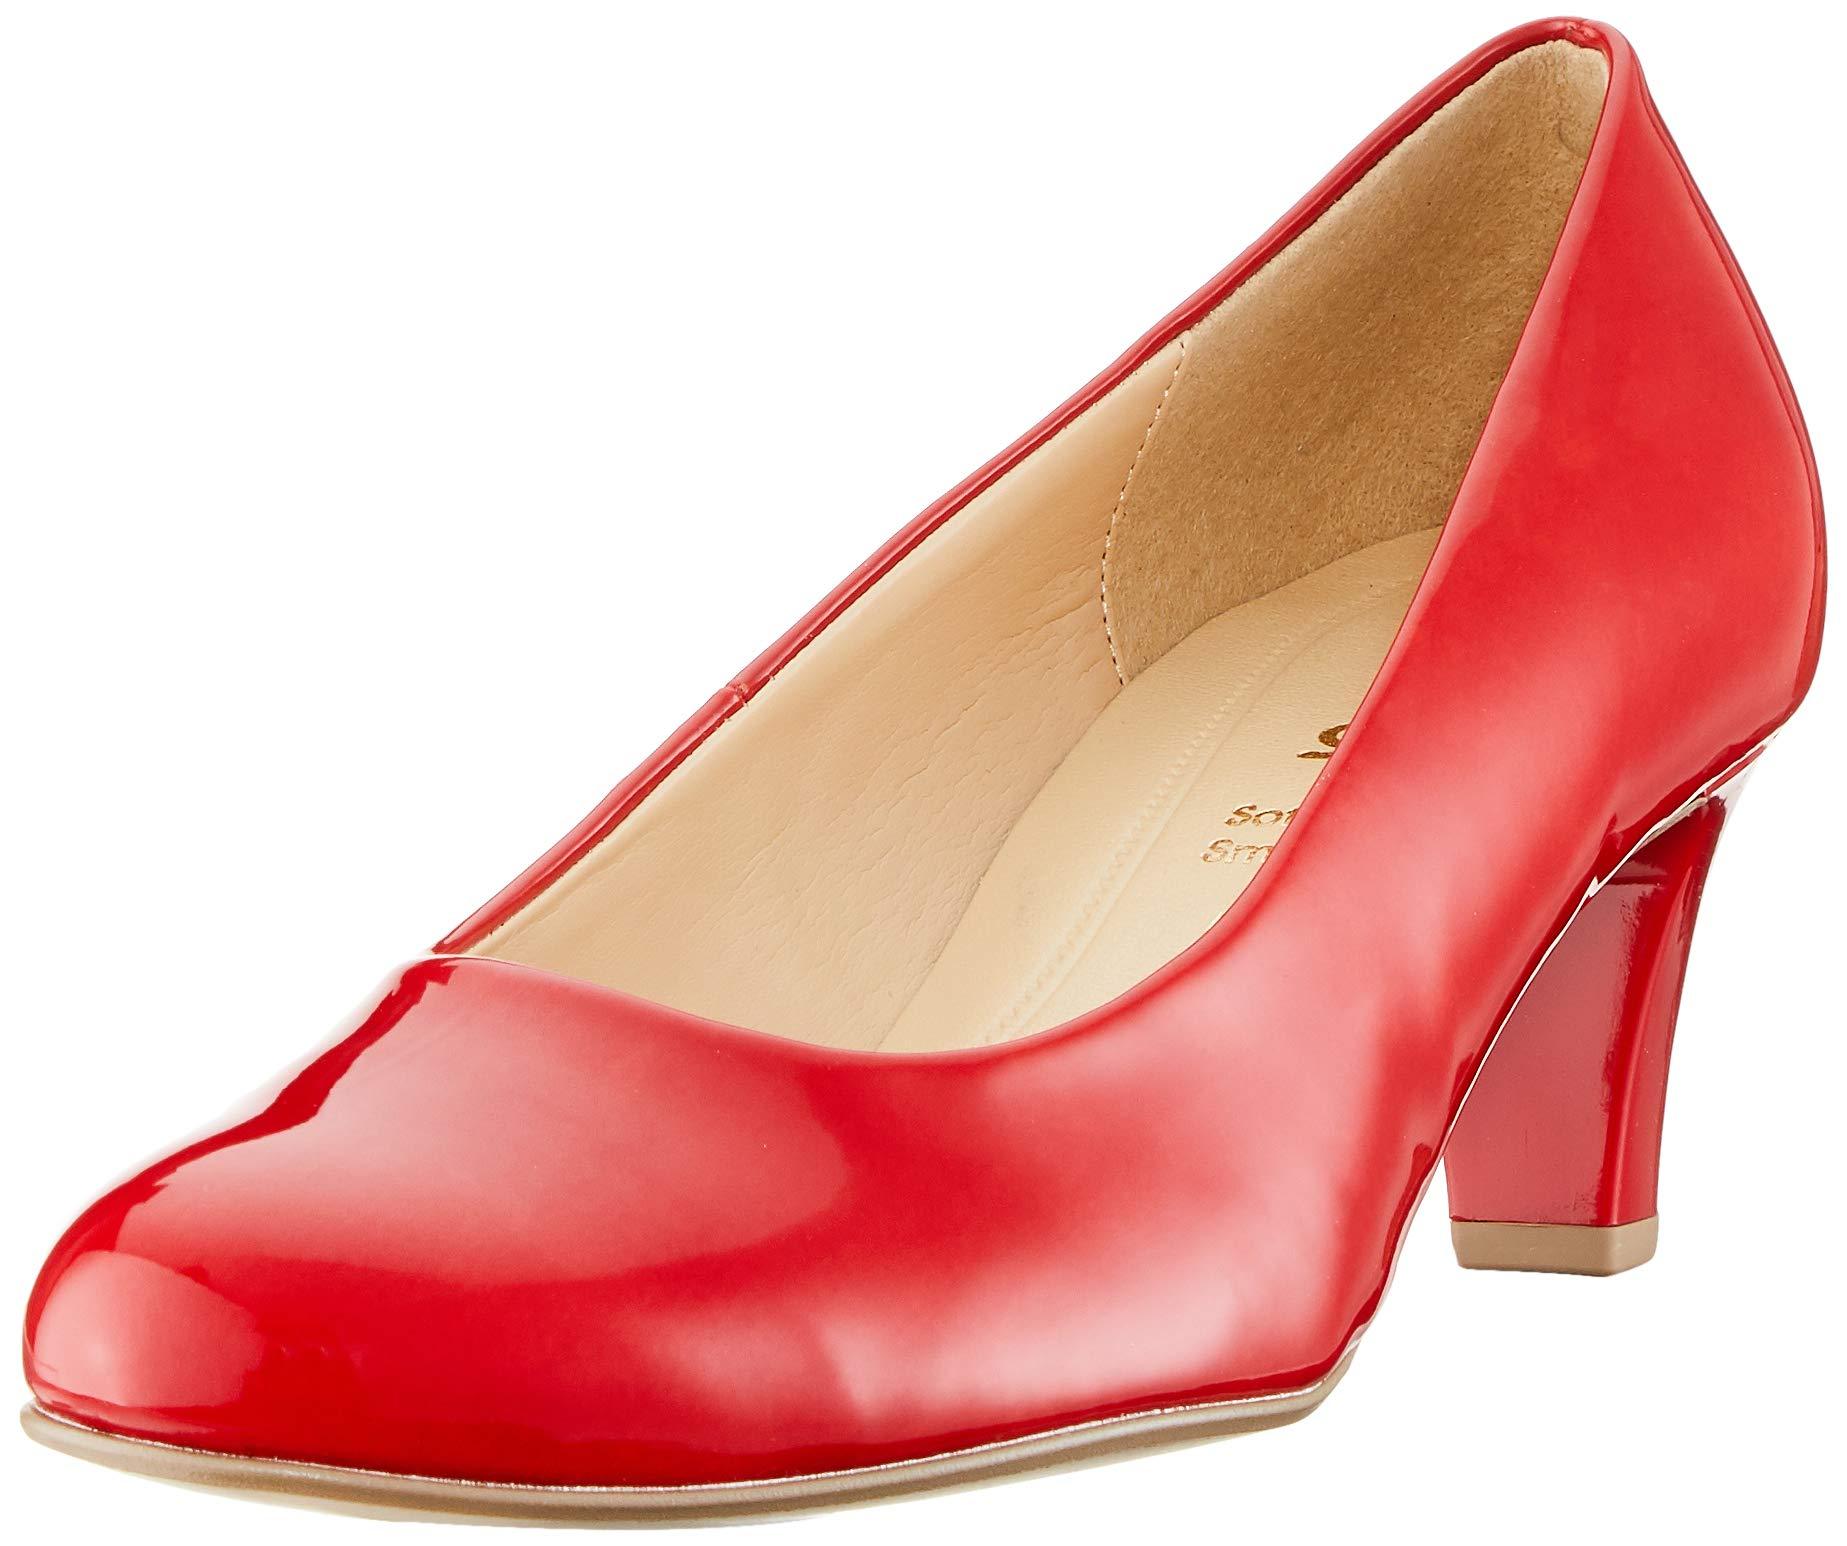 Gabor Gabor Shoes BasicEscarpins BasicEscarpins Eu FemmeRougeredabsatz9538 Shoes ebWE92IDHY